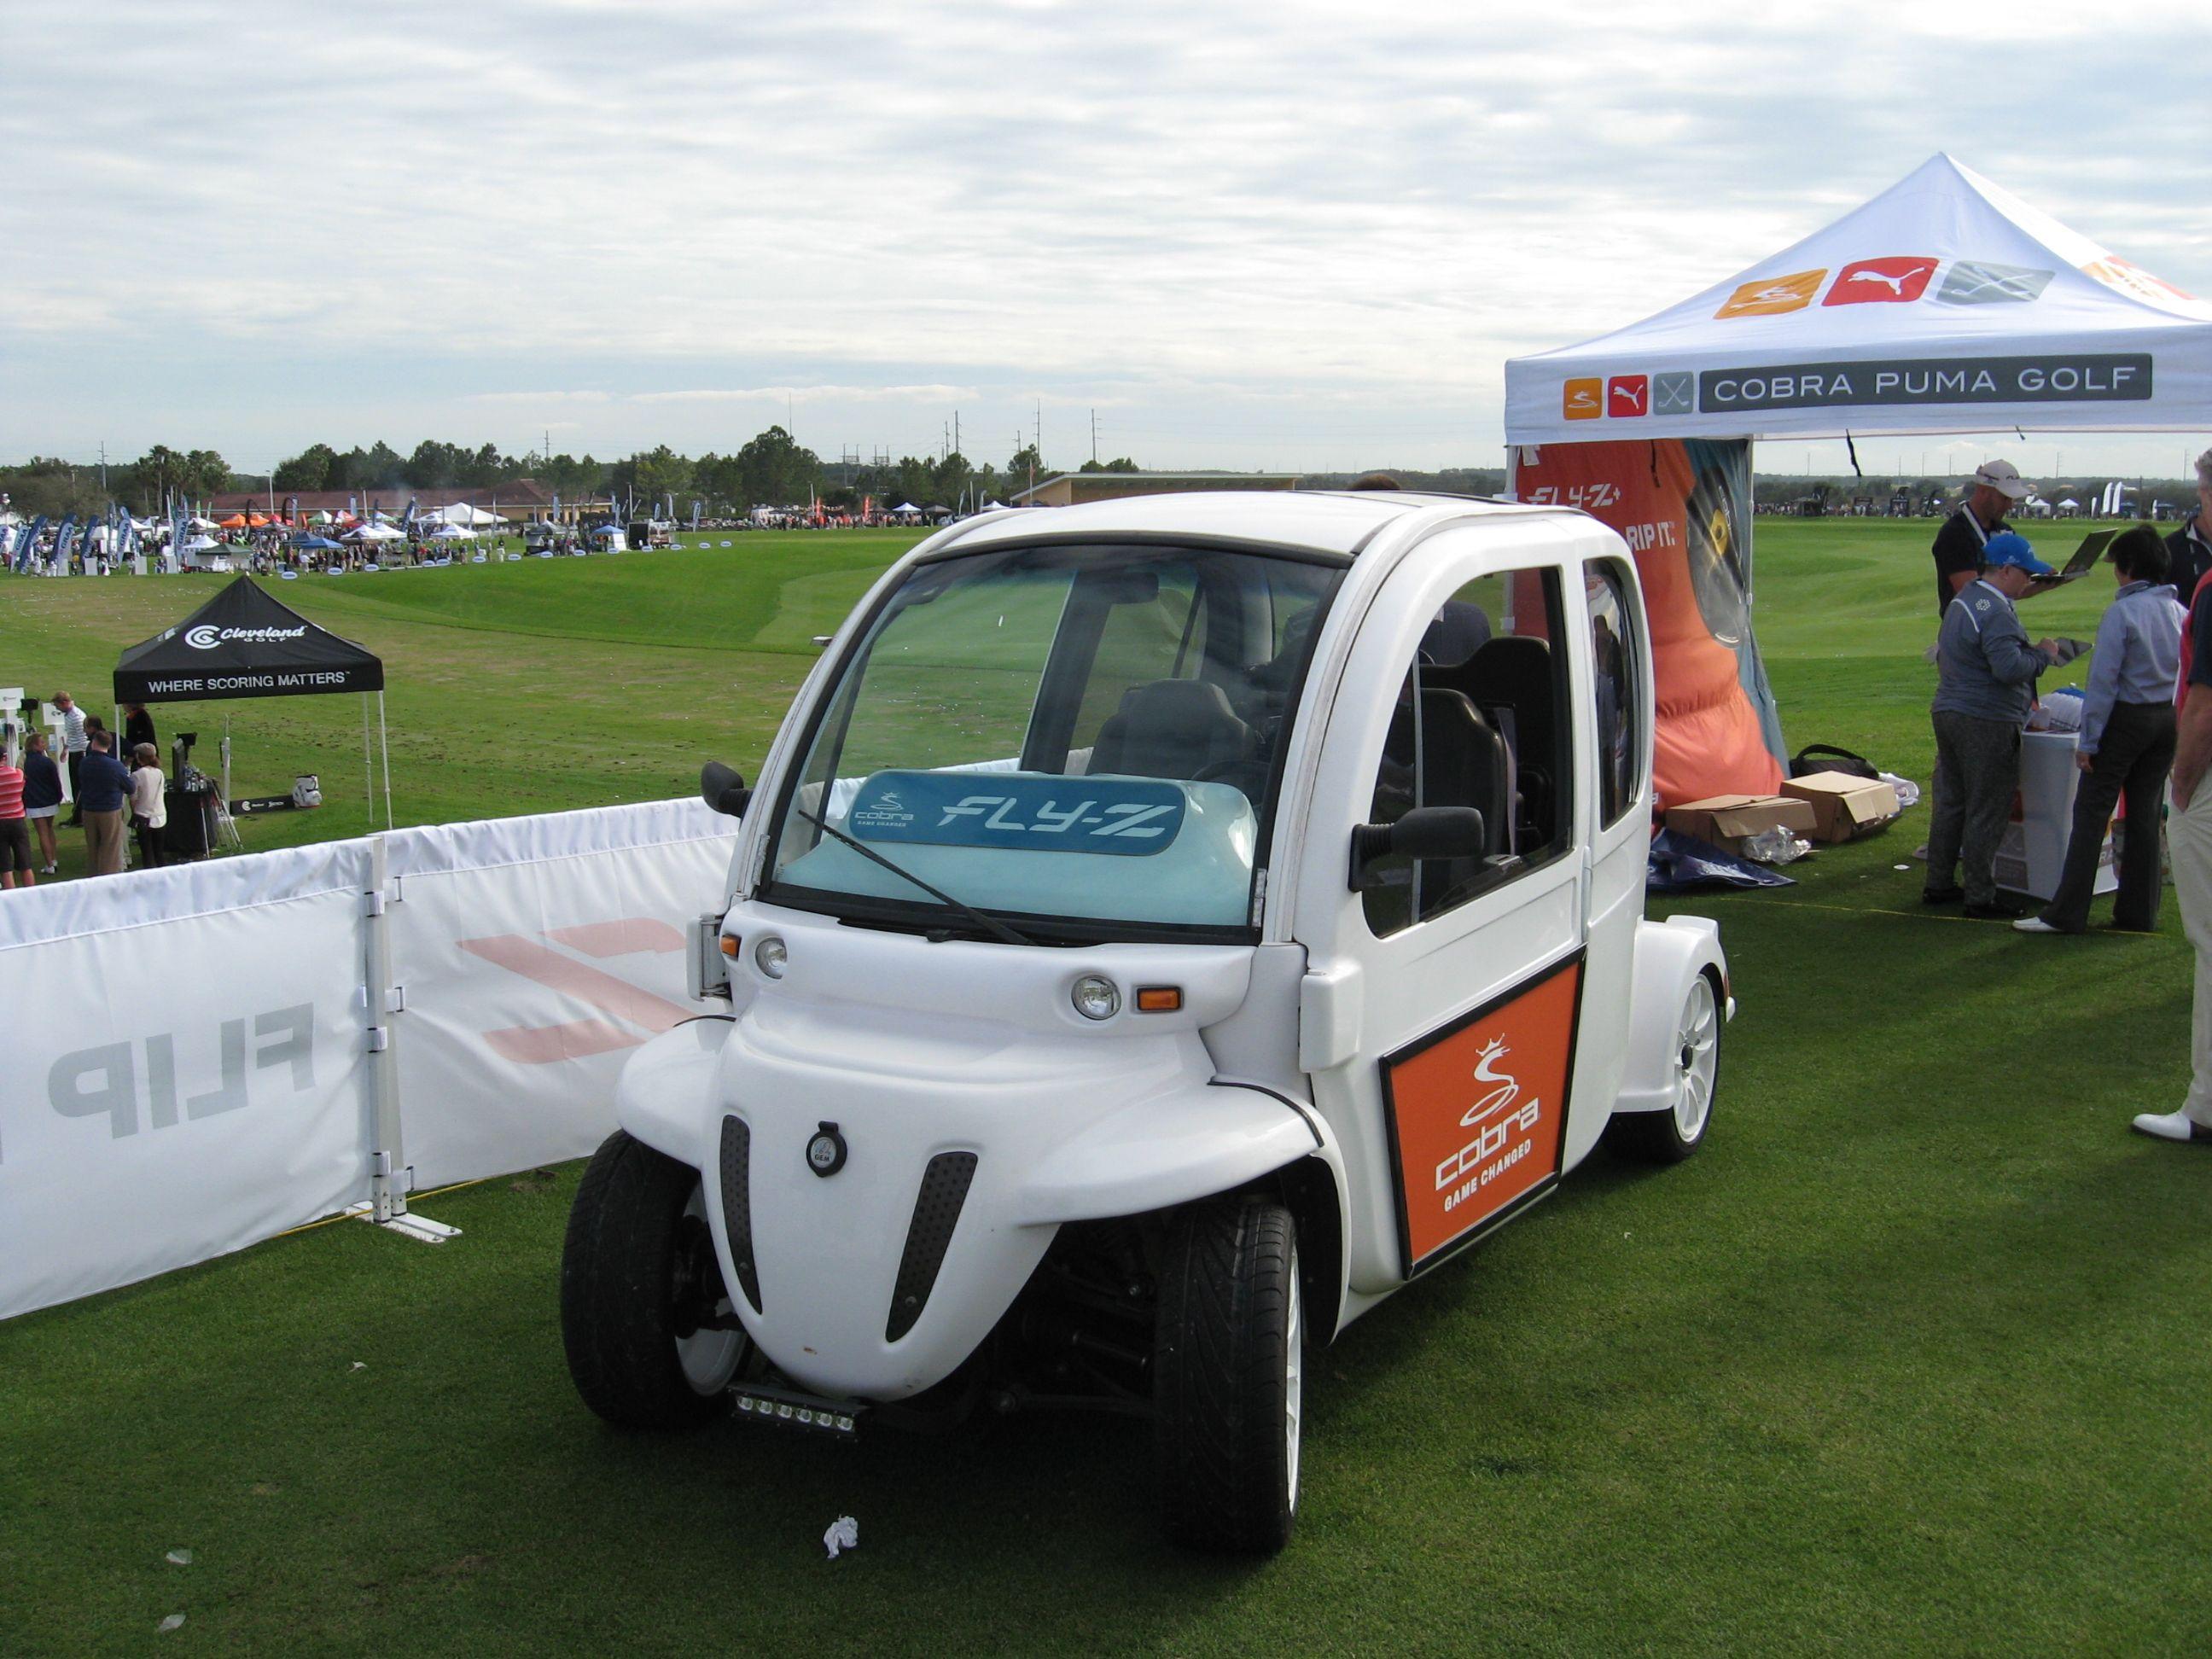 Demo Day - Puma Golf / Cobra Golf